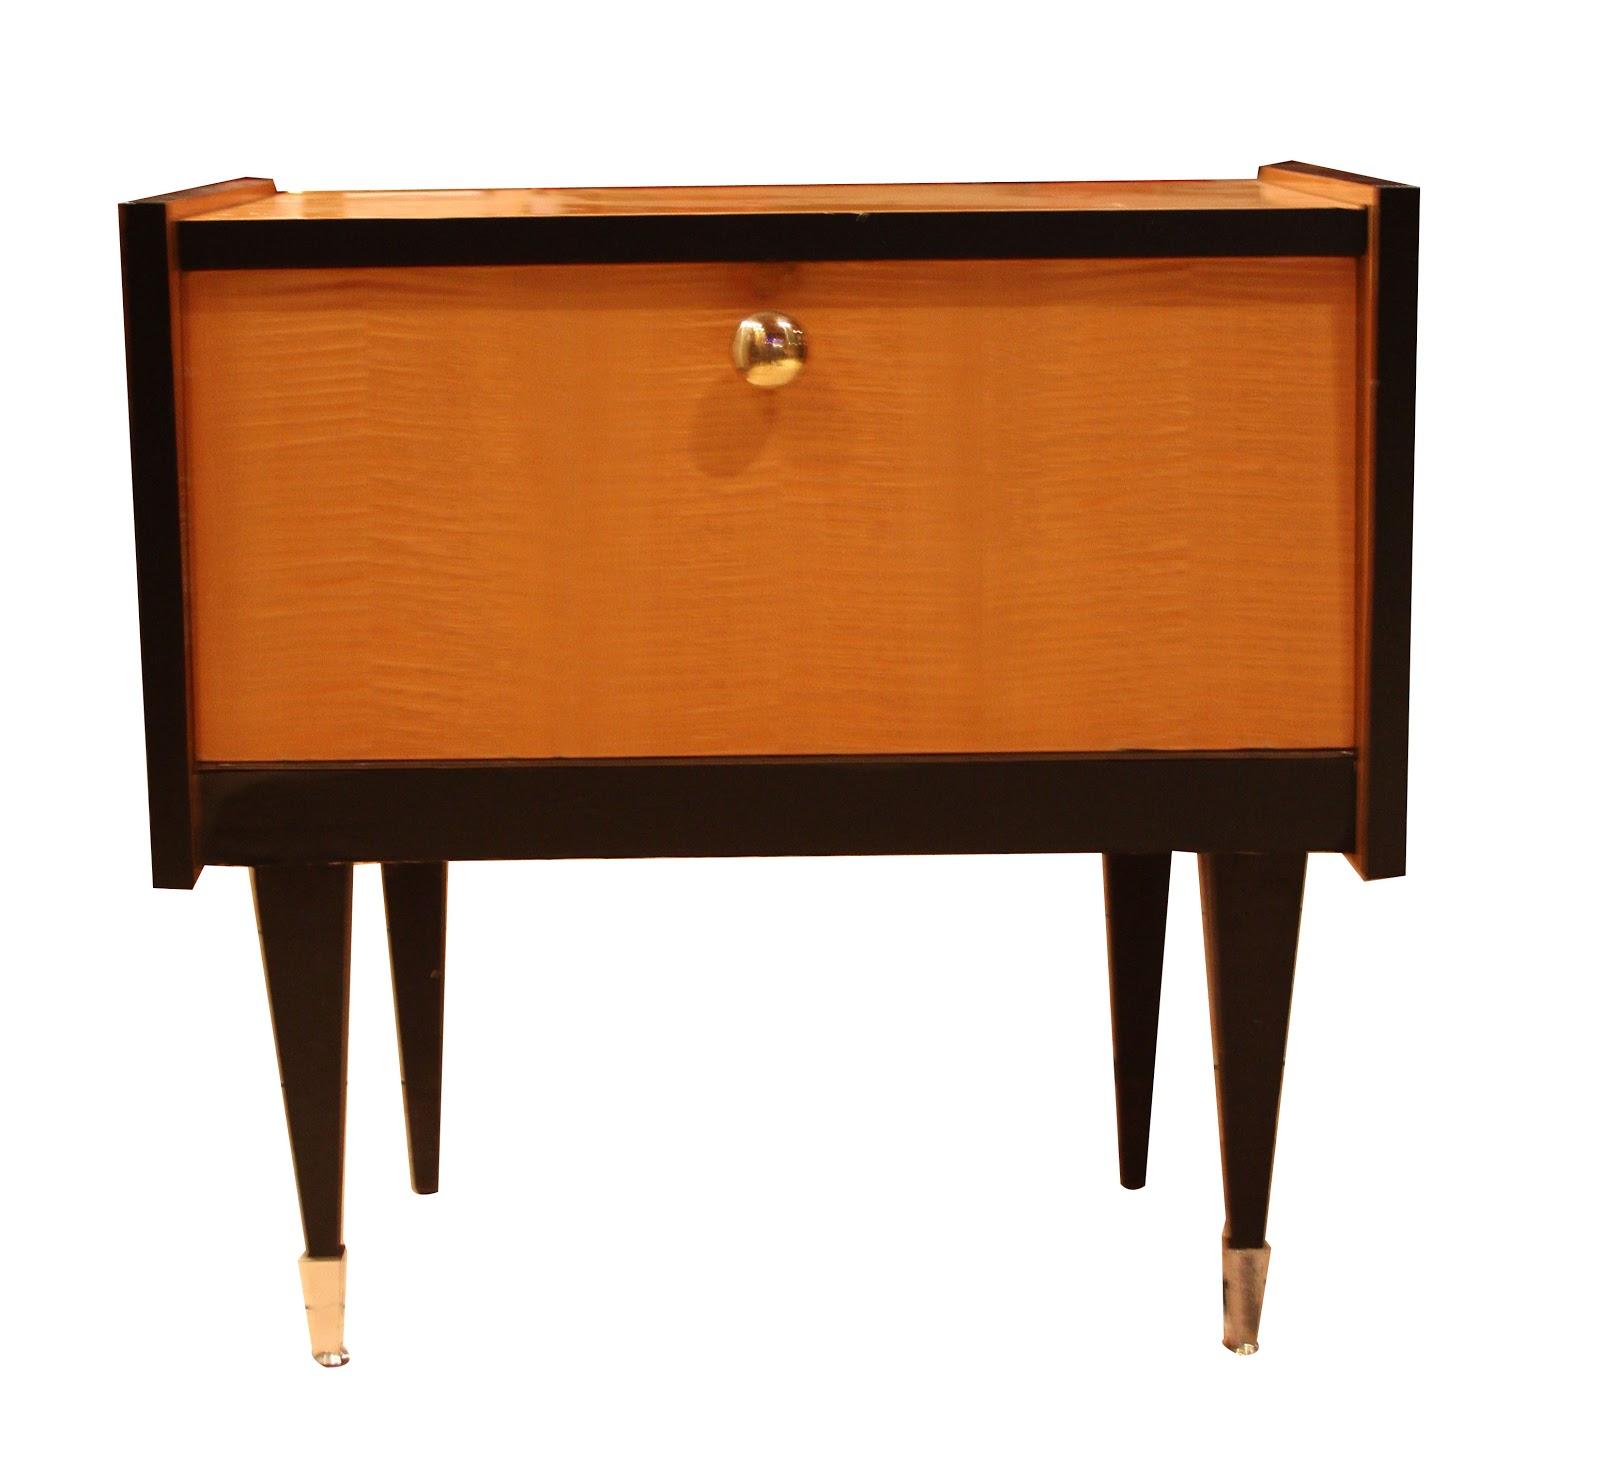 Chicbaazar objets vintage 50 60 70 petit chevet 1950 - Miroir chaty vallauris prix ...